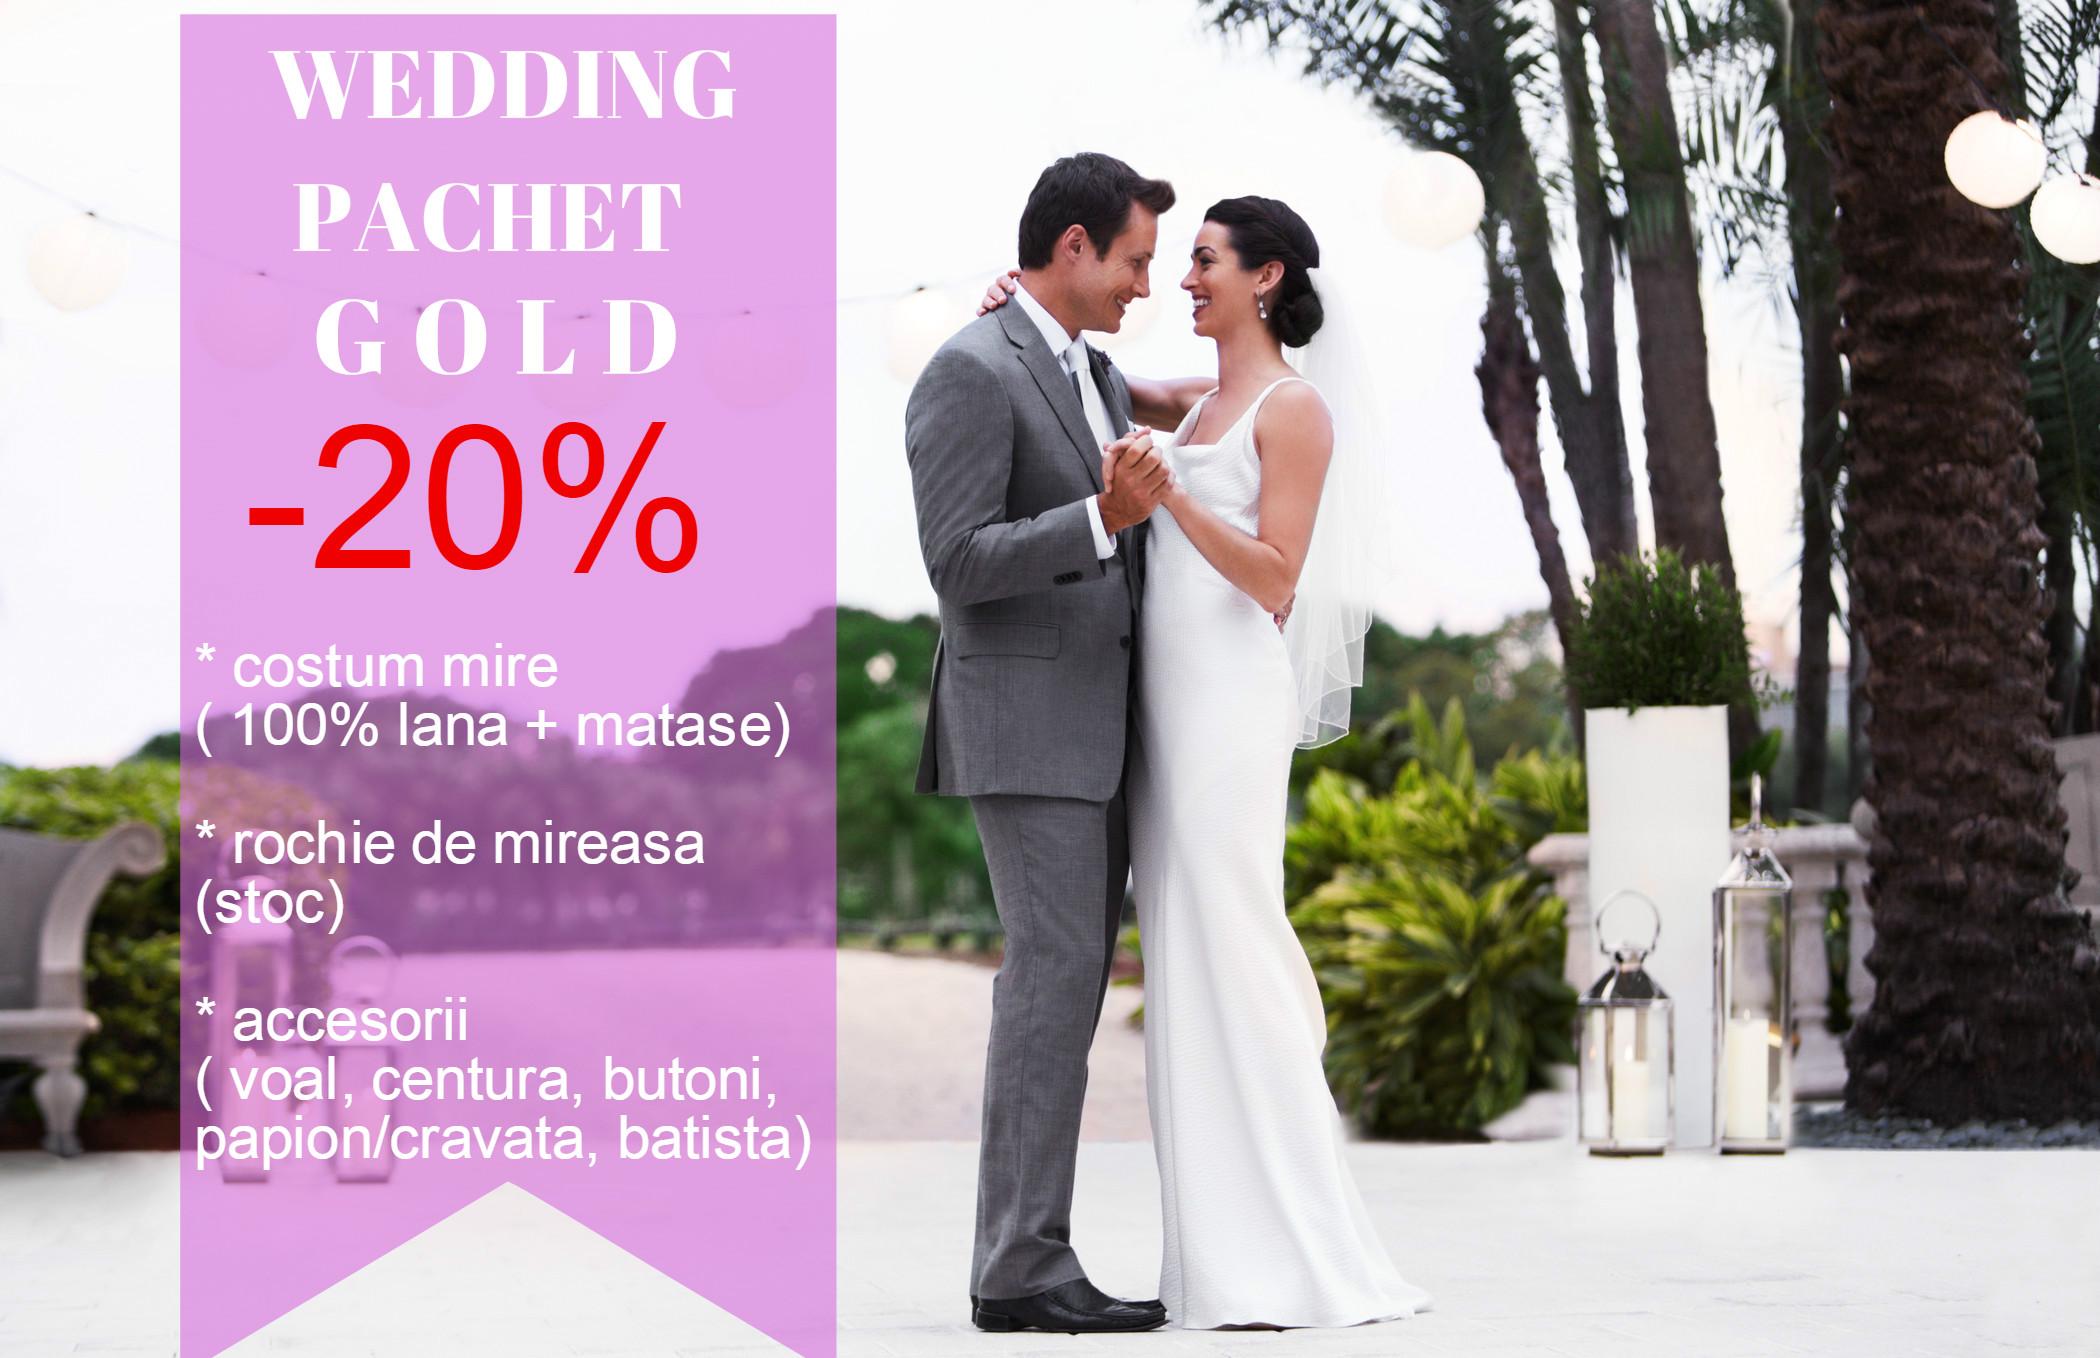 wedding-pachet-gold